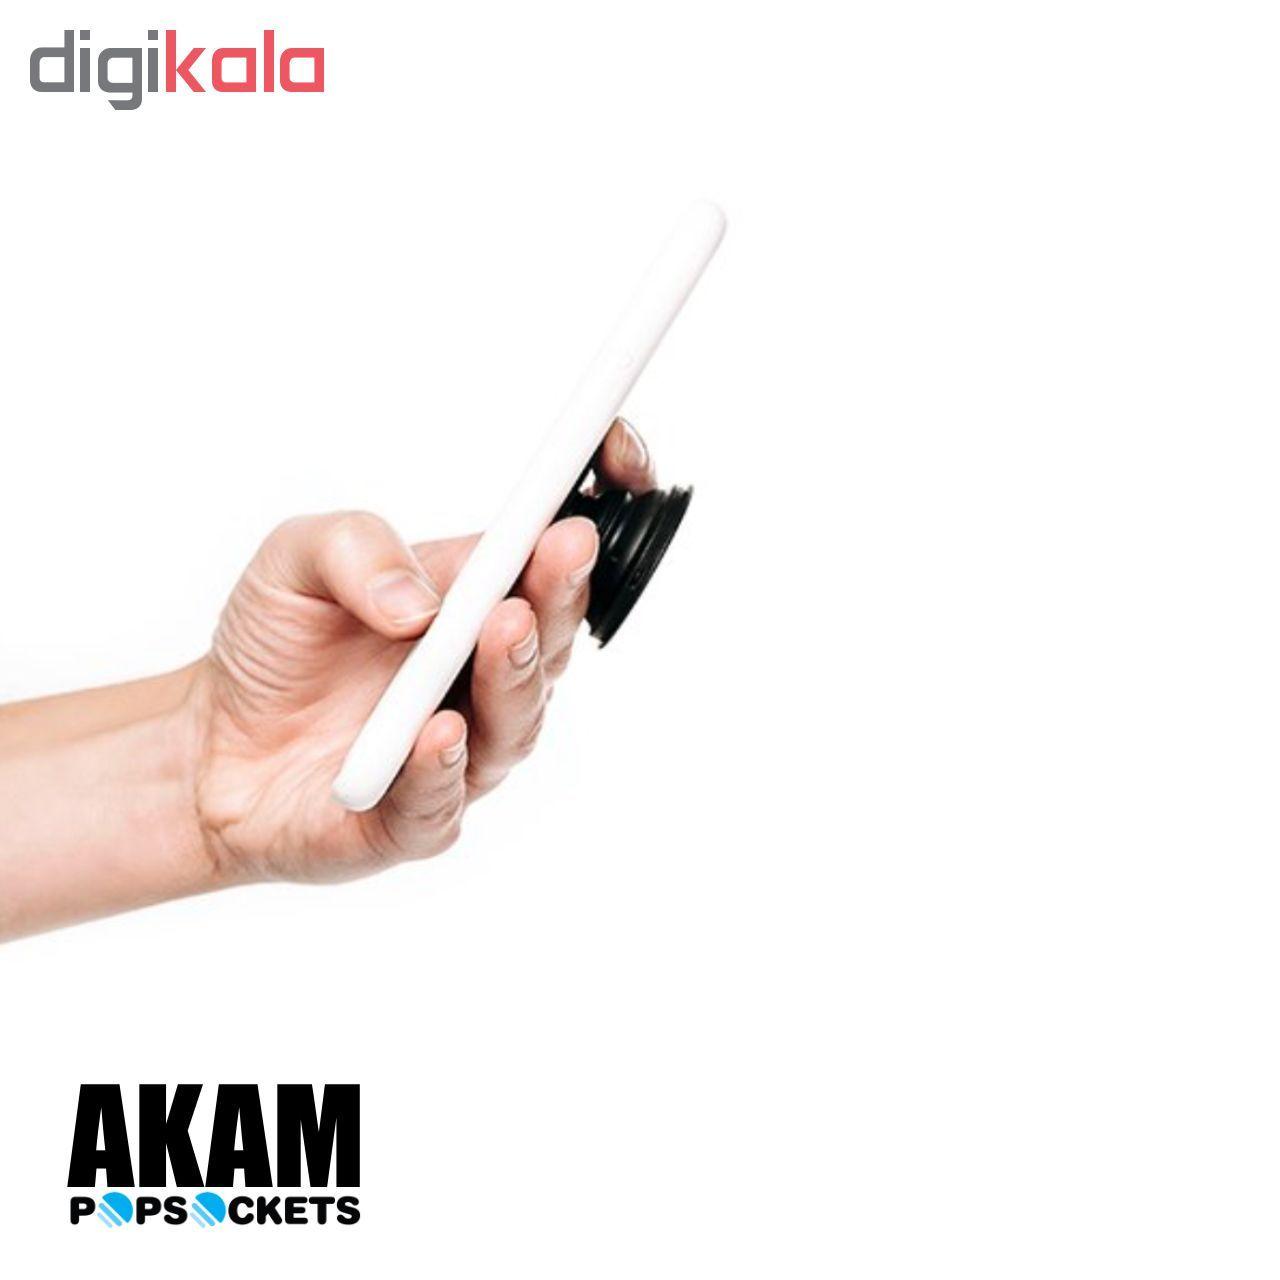 پایه نگهدارنده گوشی موبایل پاپ سوکت آکام مدل APS0195 main 1 8